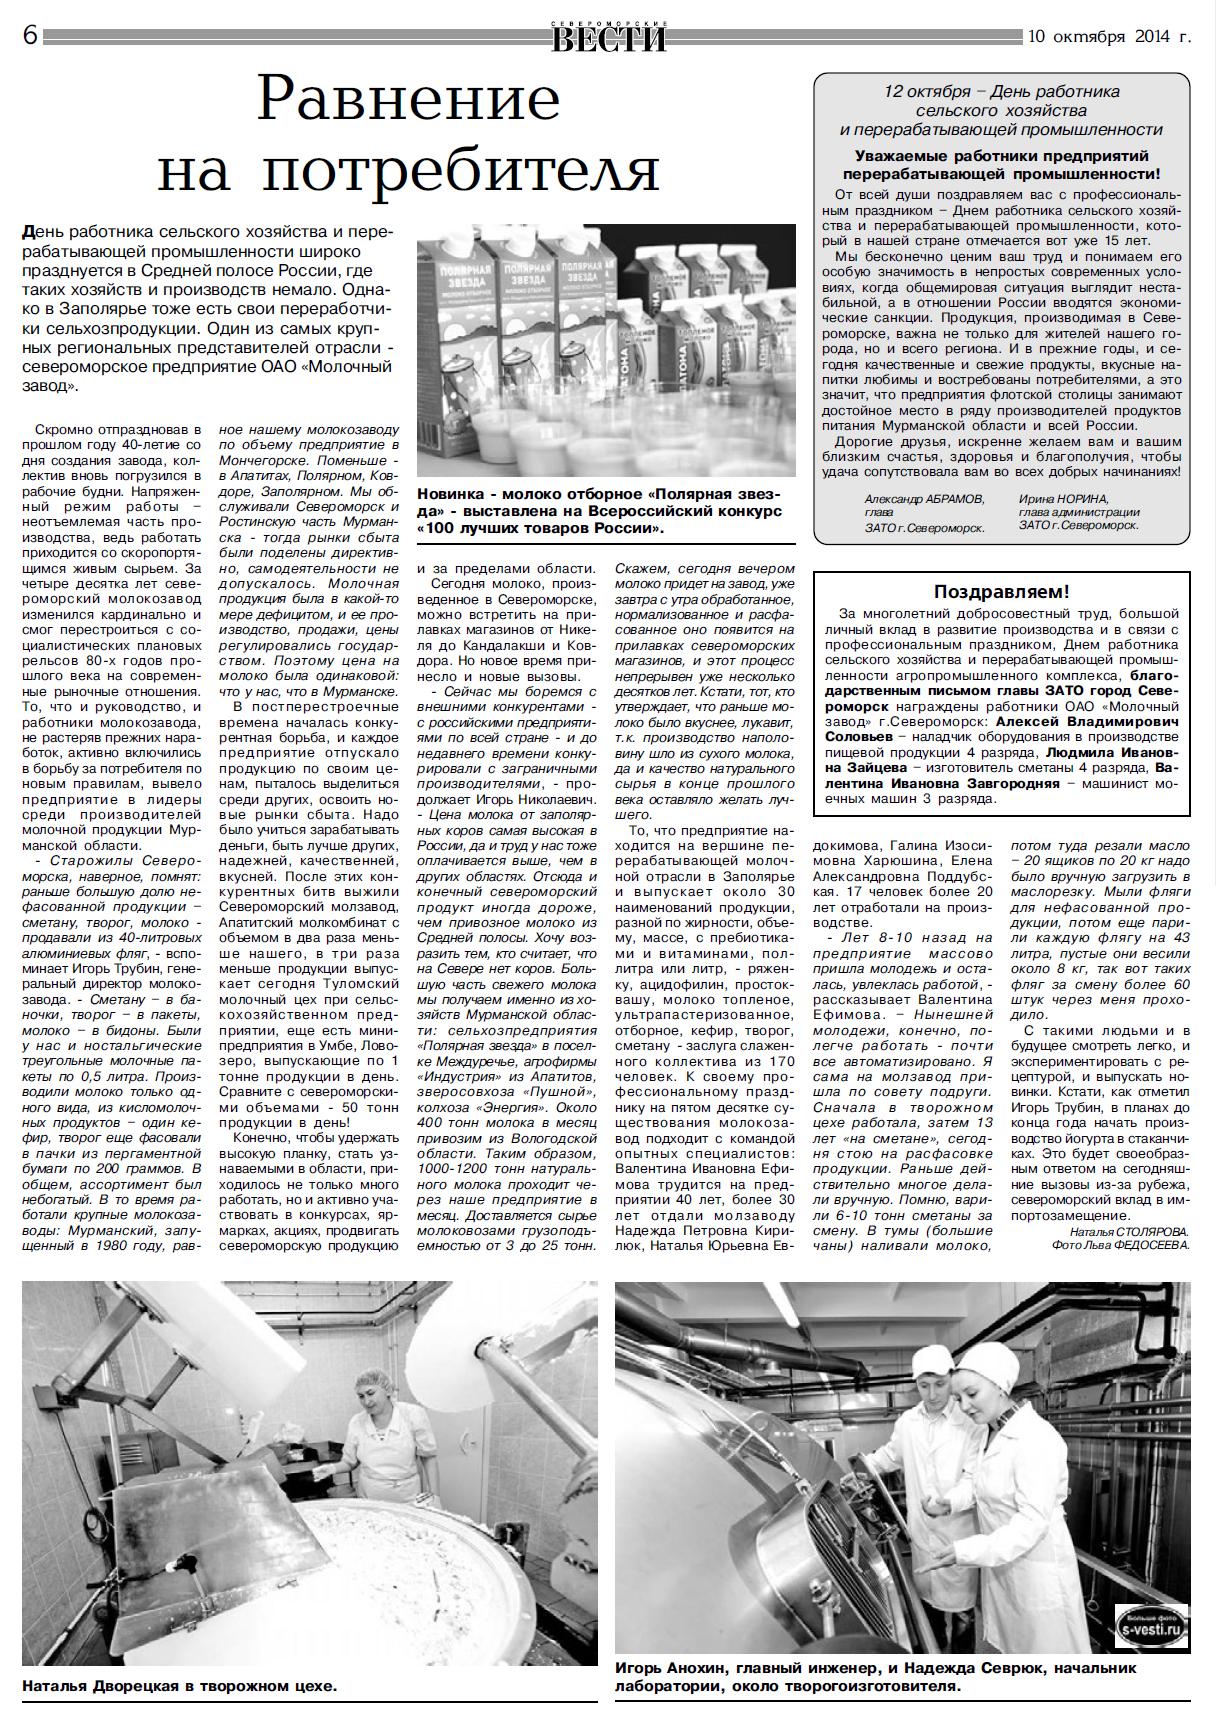 Равнение на потребителя.Североморские Вести №41 от 10.10.2014